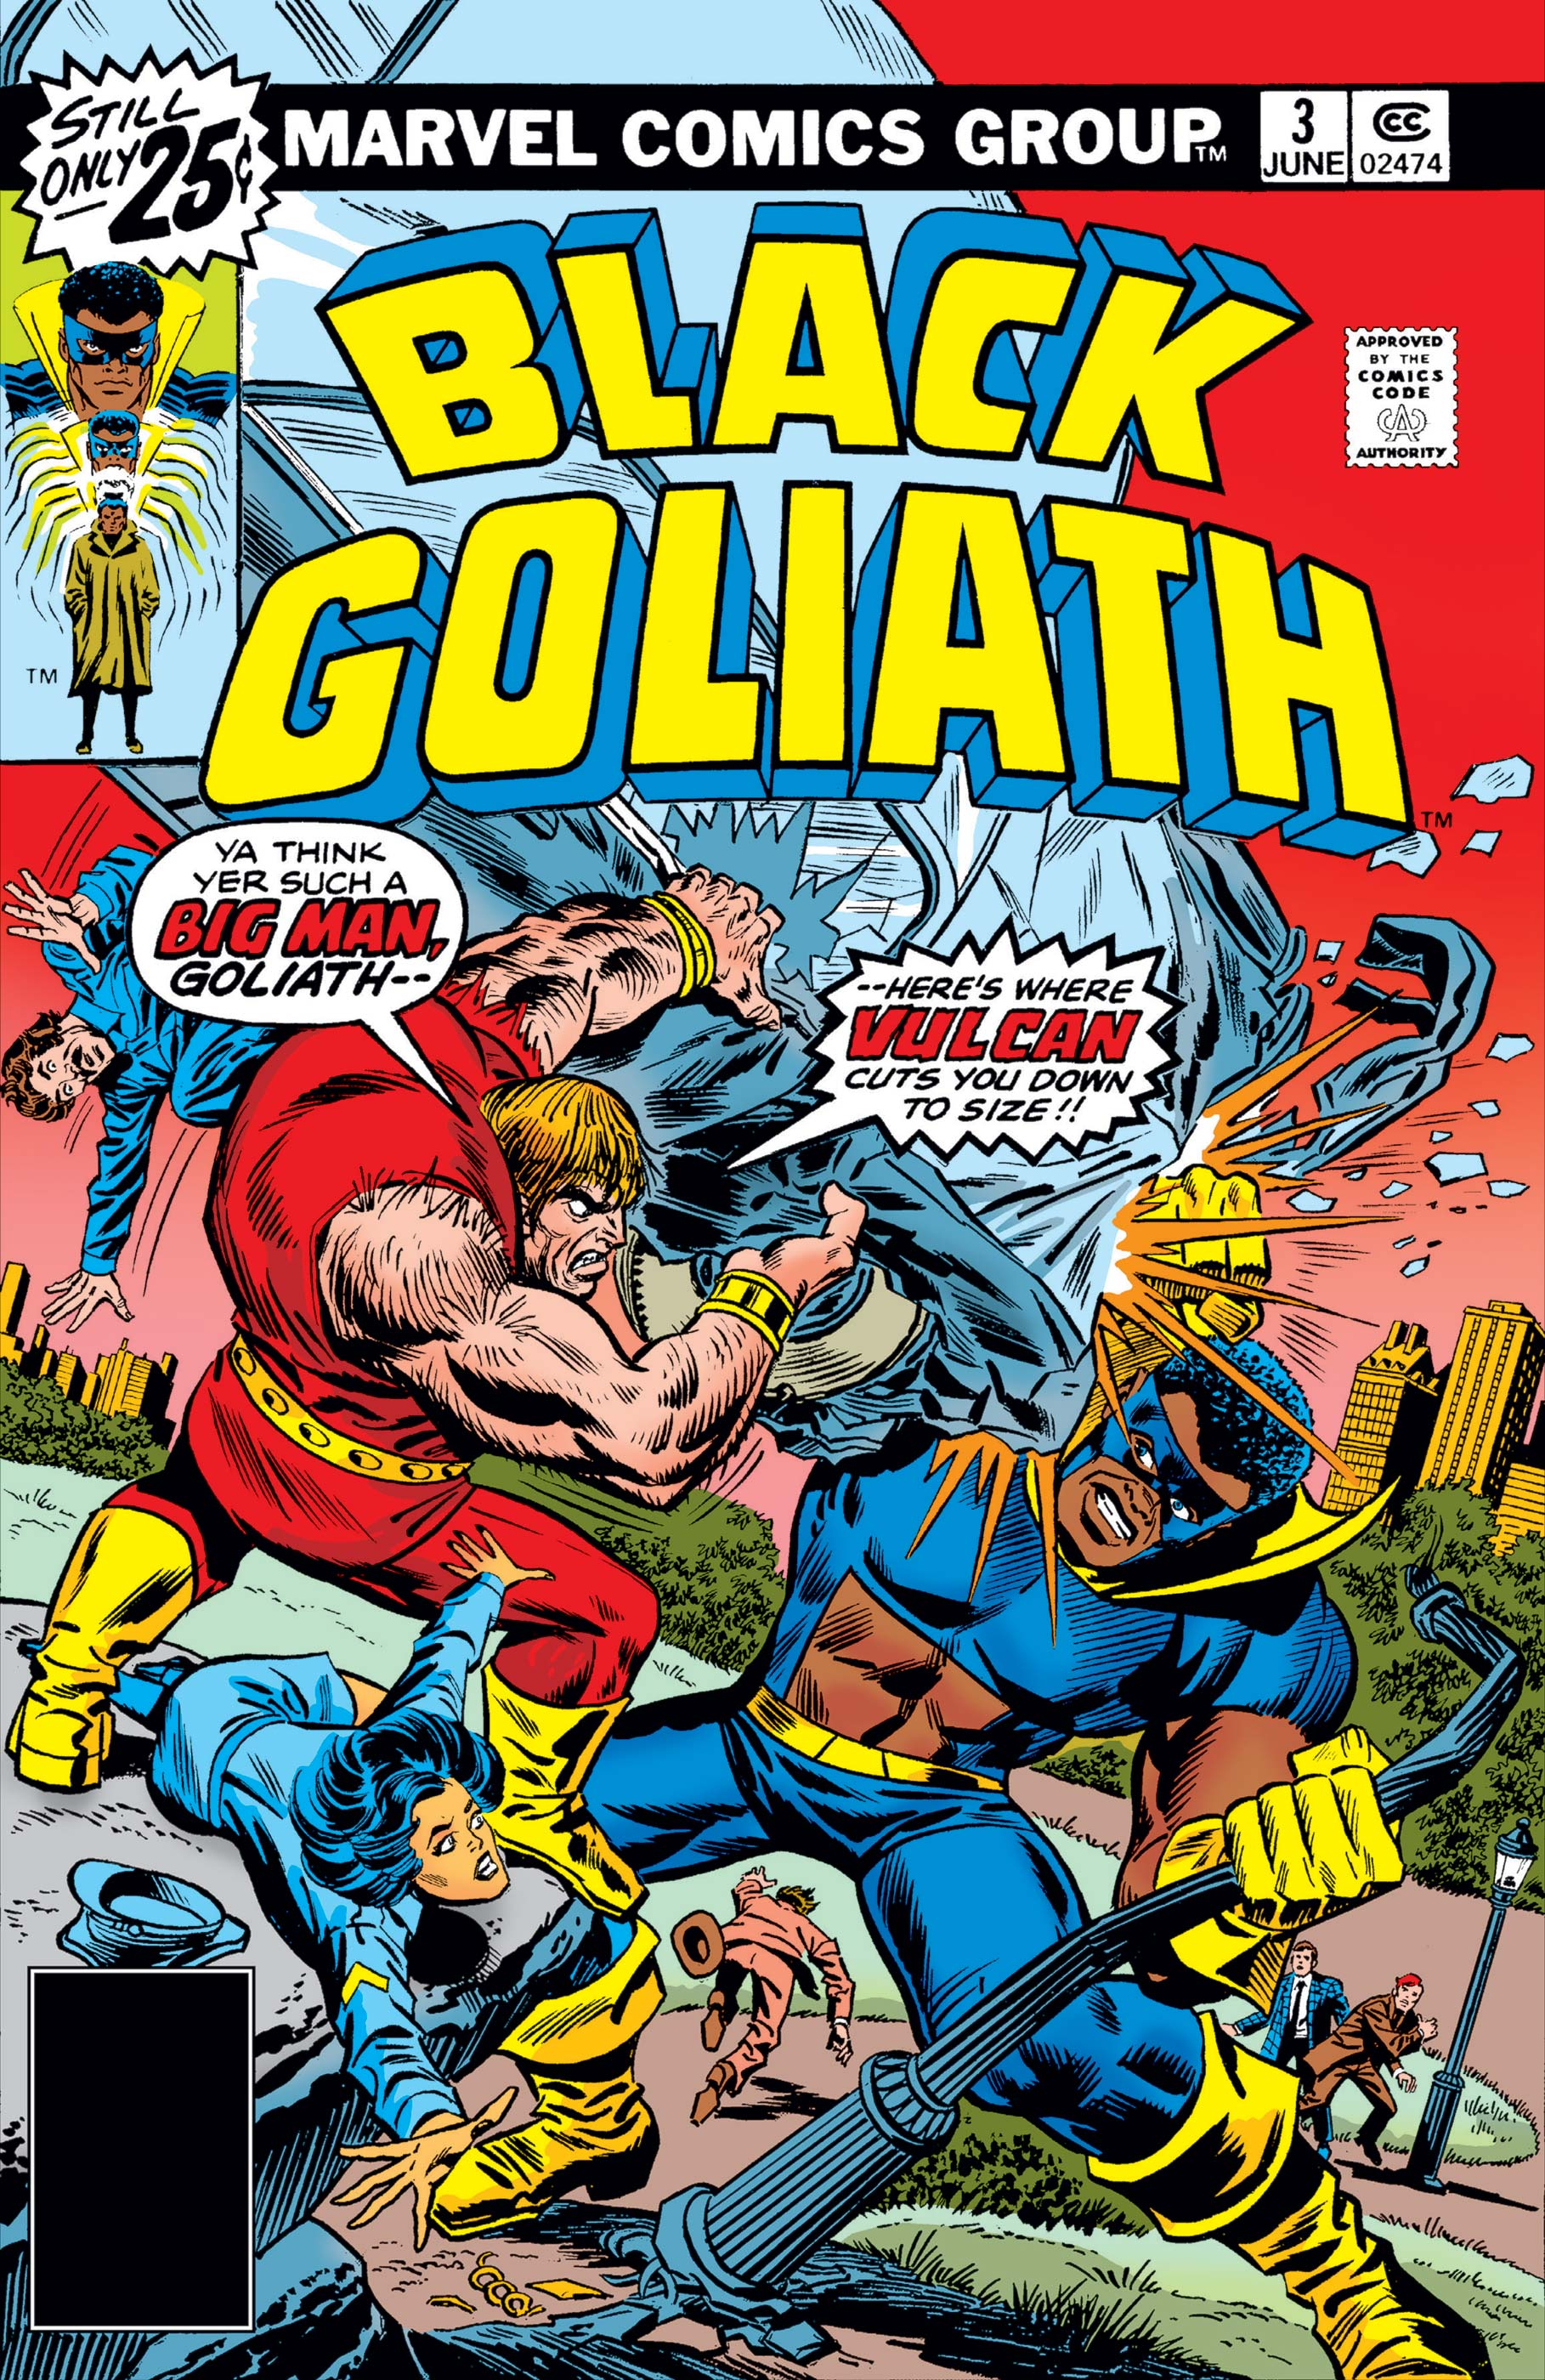 Black Goliath (1976) #3